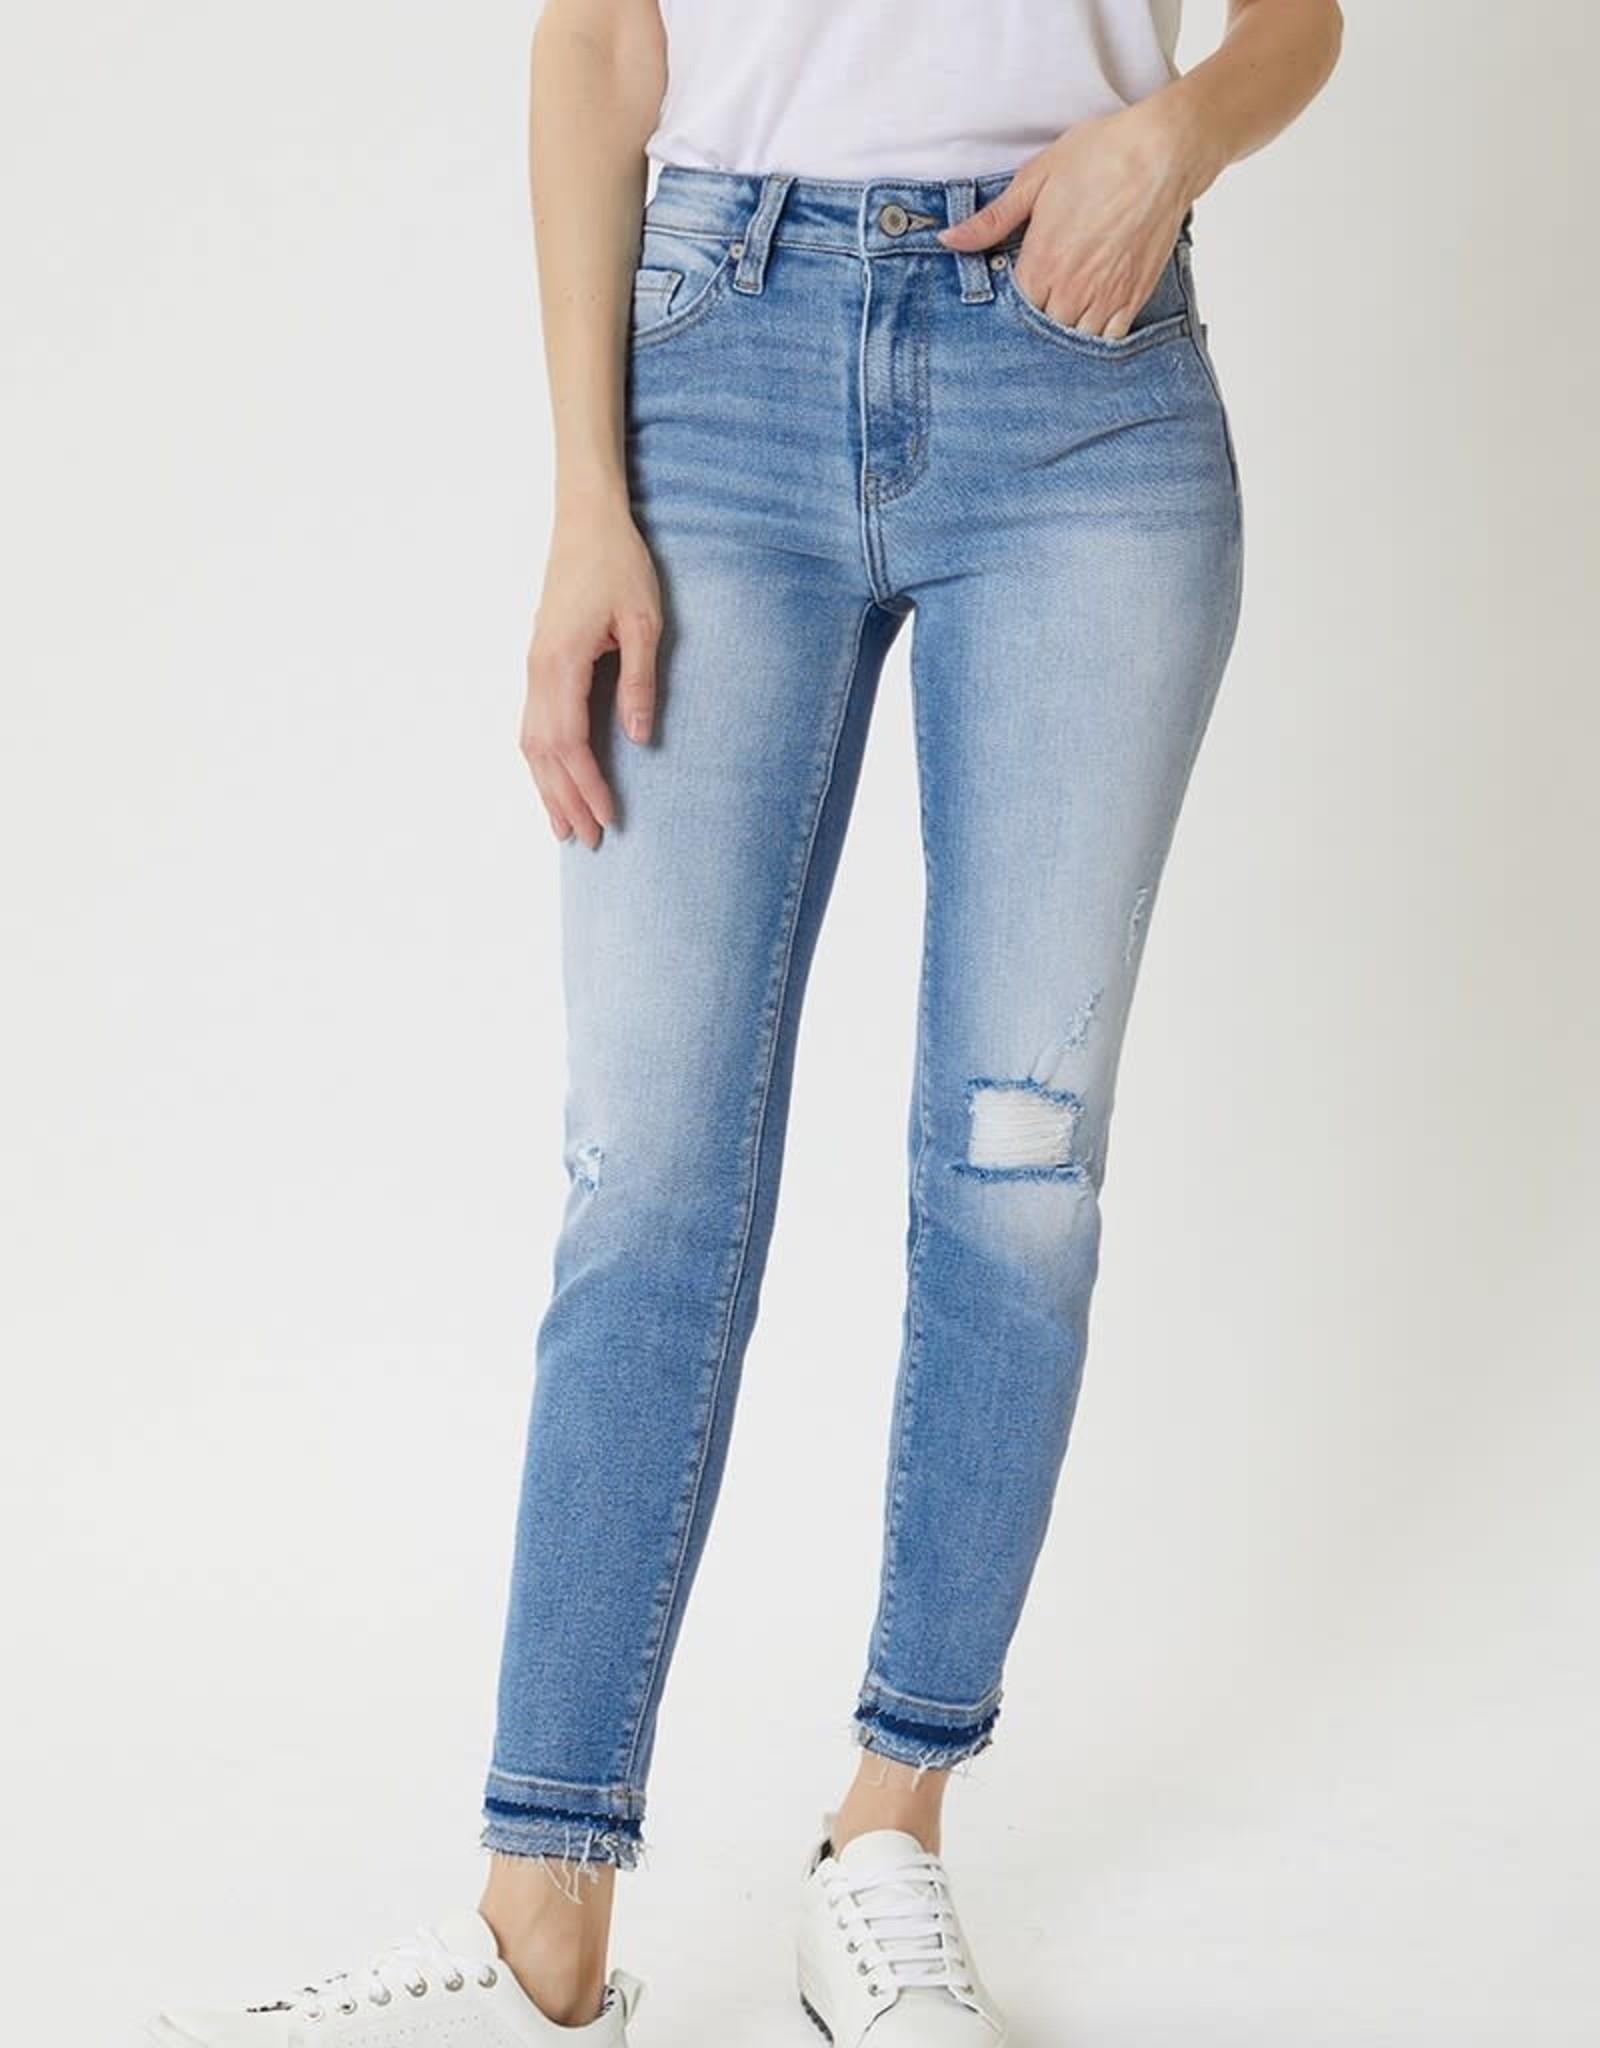 Miss Bliss High Rise Hem Detail Ankle Skinny- White Wash